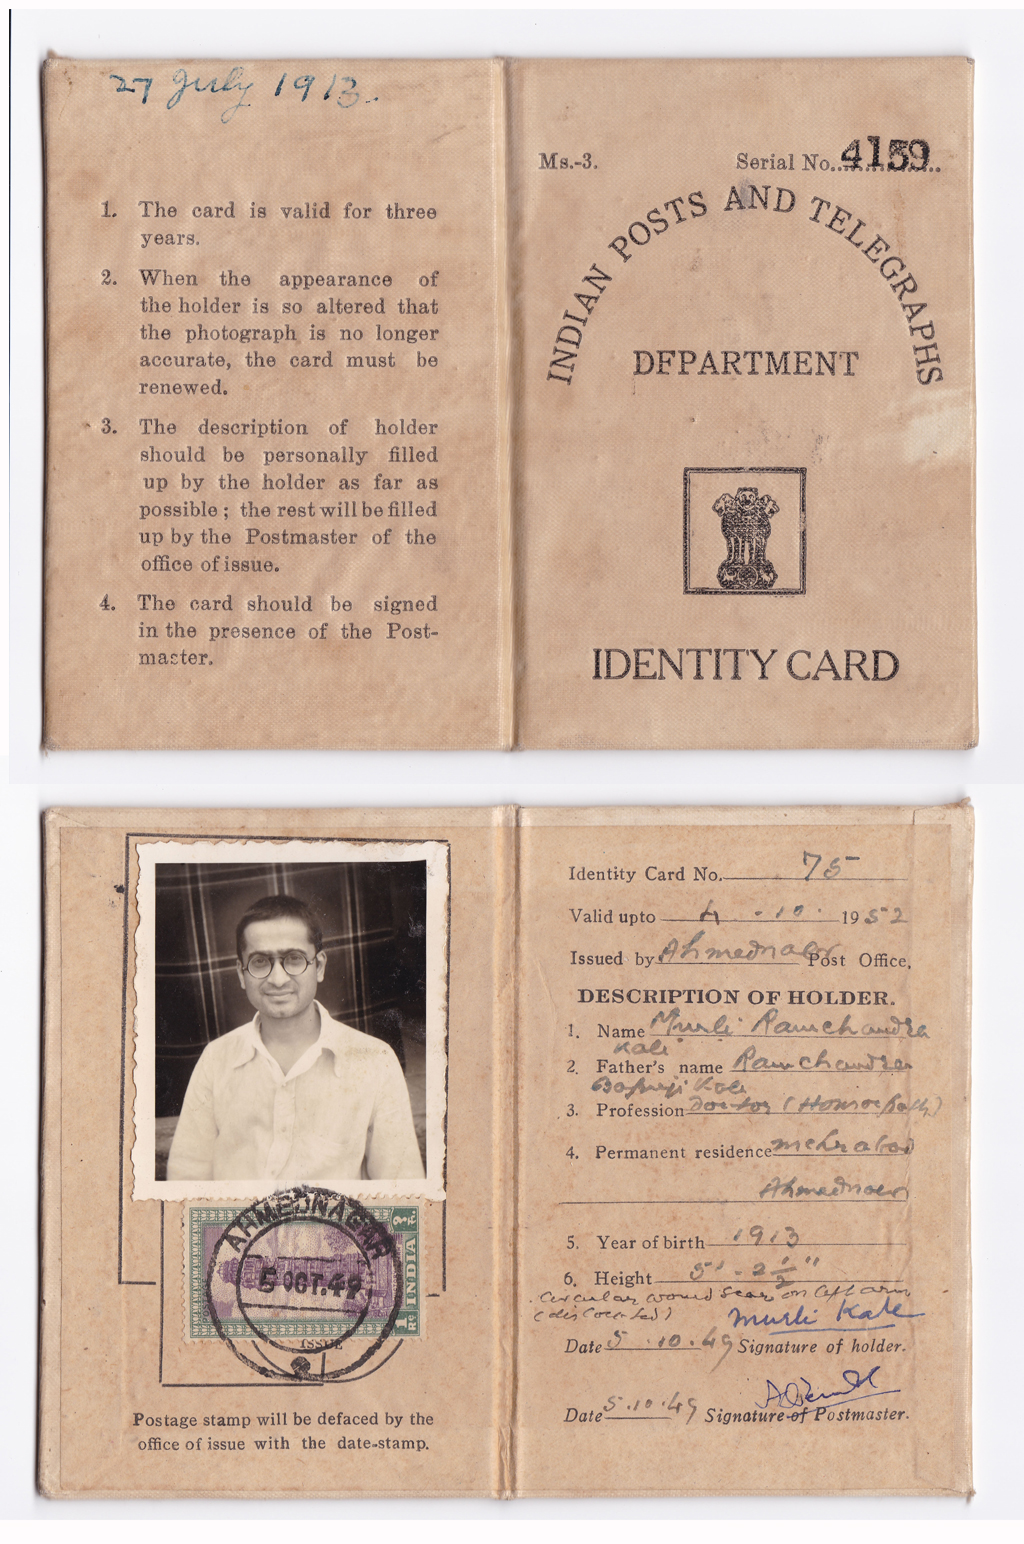 Murli Kale New Life Meherabad Post Office ID Card for Mandali